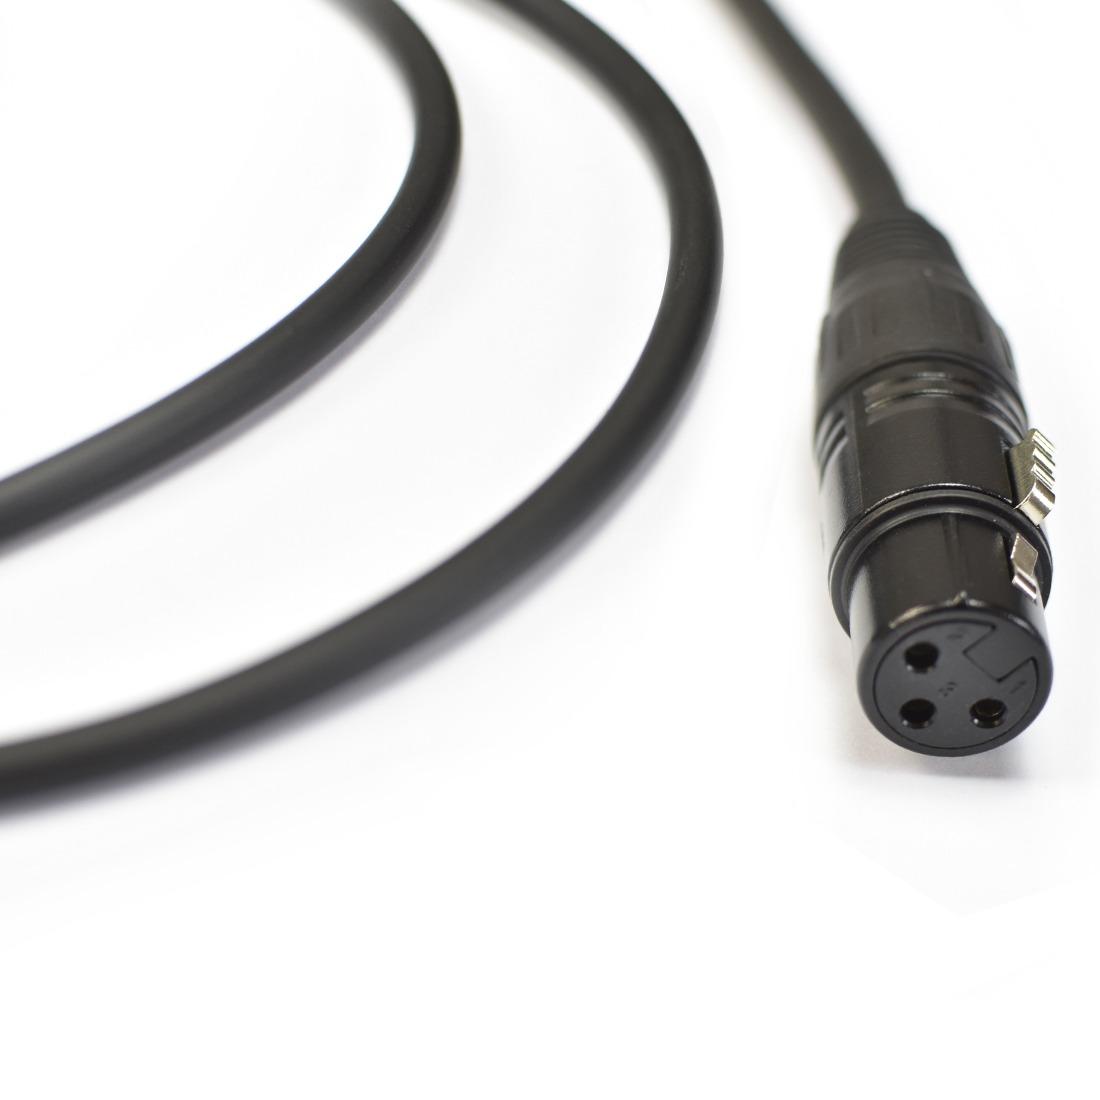 CABO DE MICROFONE 0,20MM CONECTORES P10 X XLRF MOD NINJAHG B 10FT/3.05